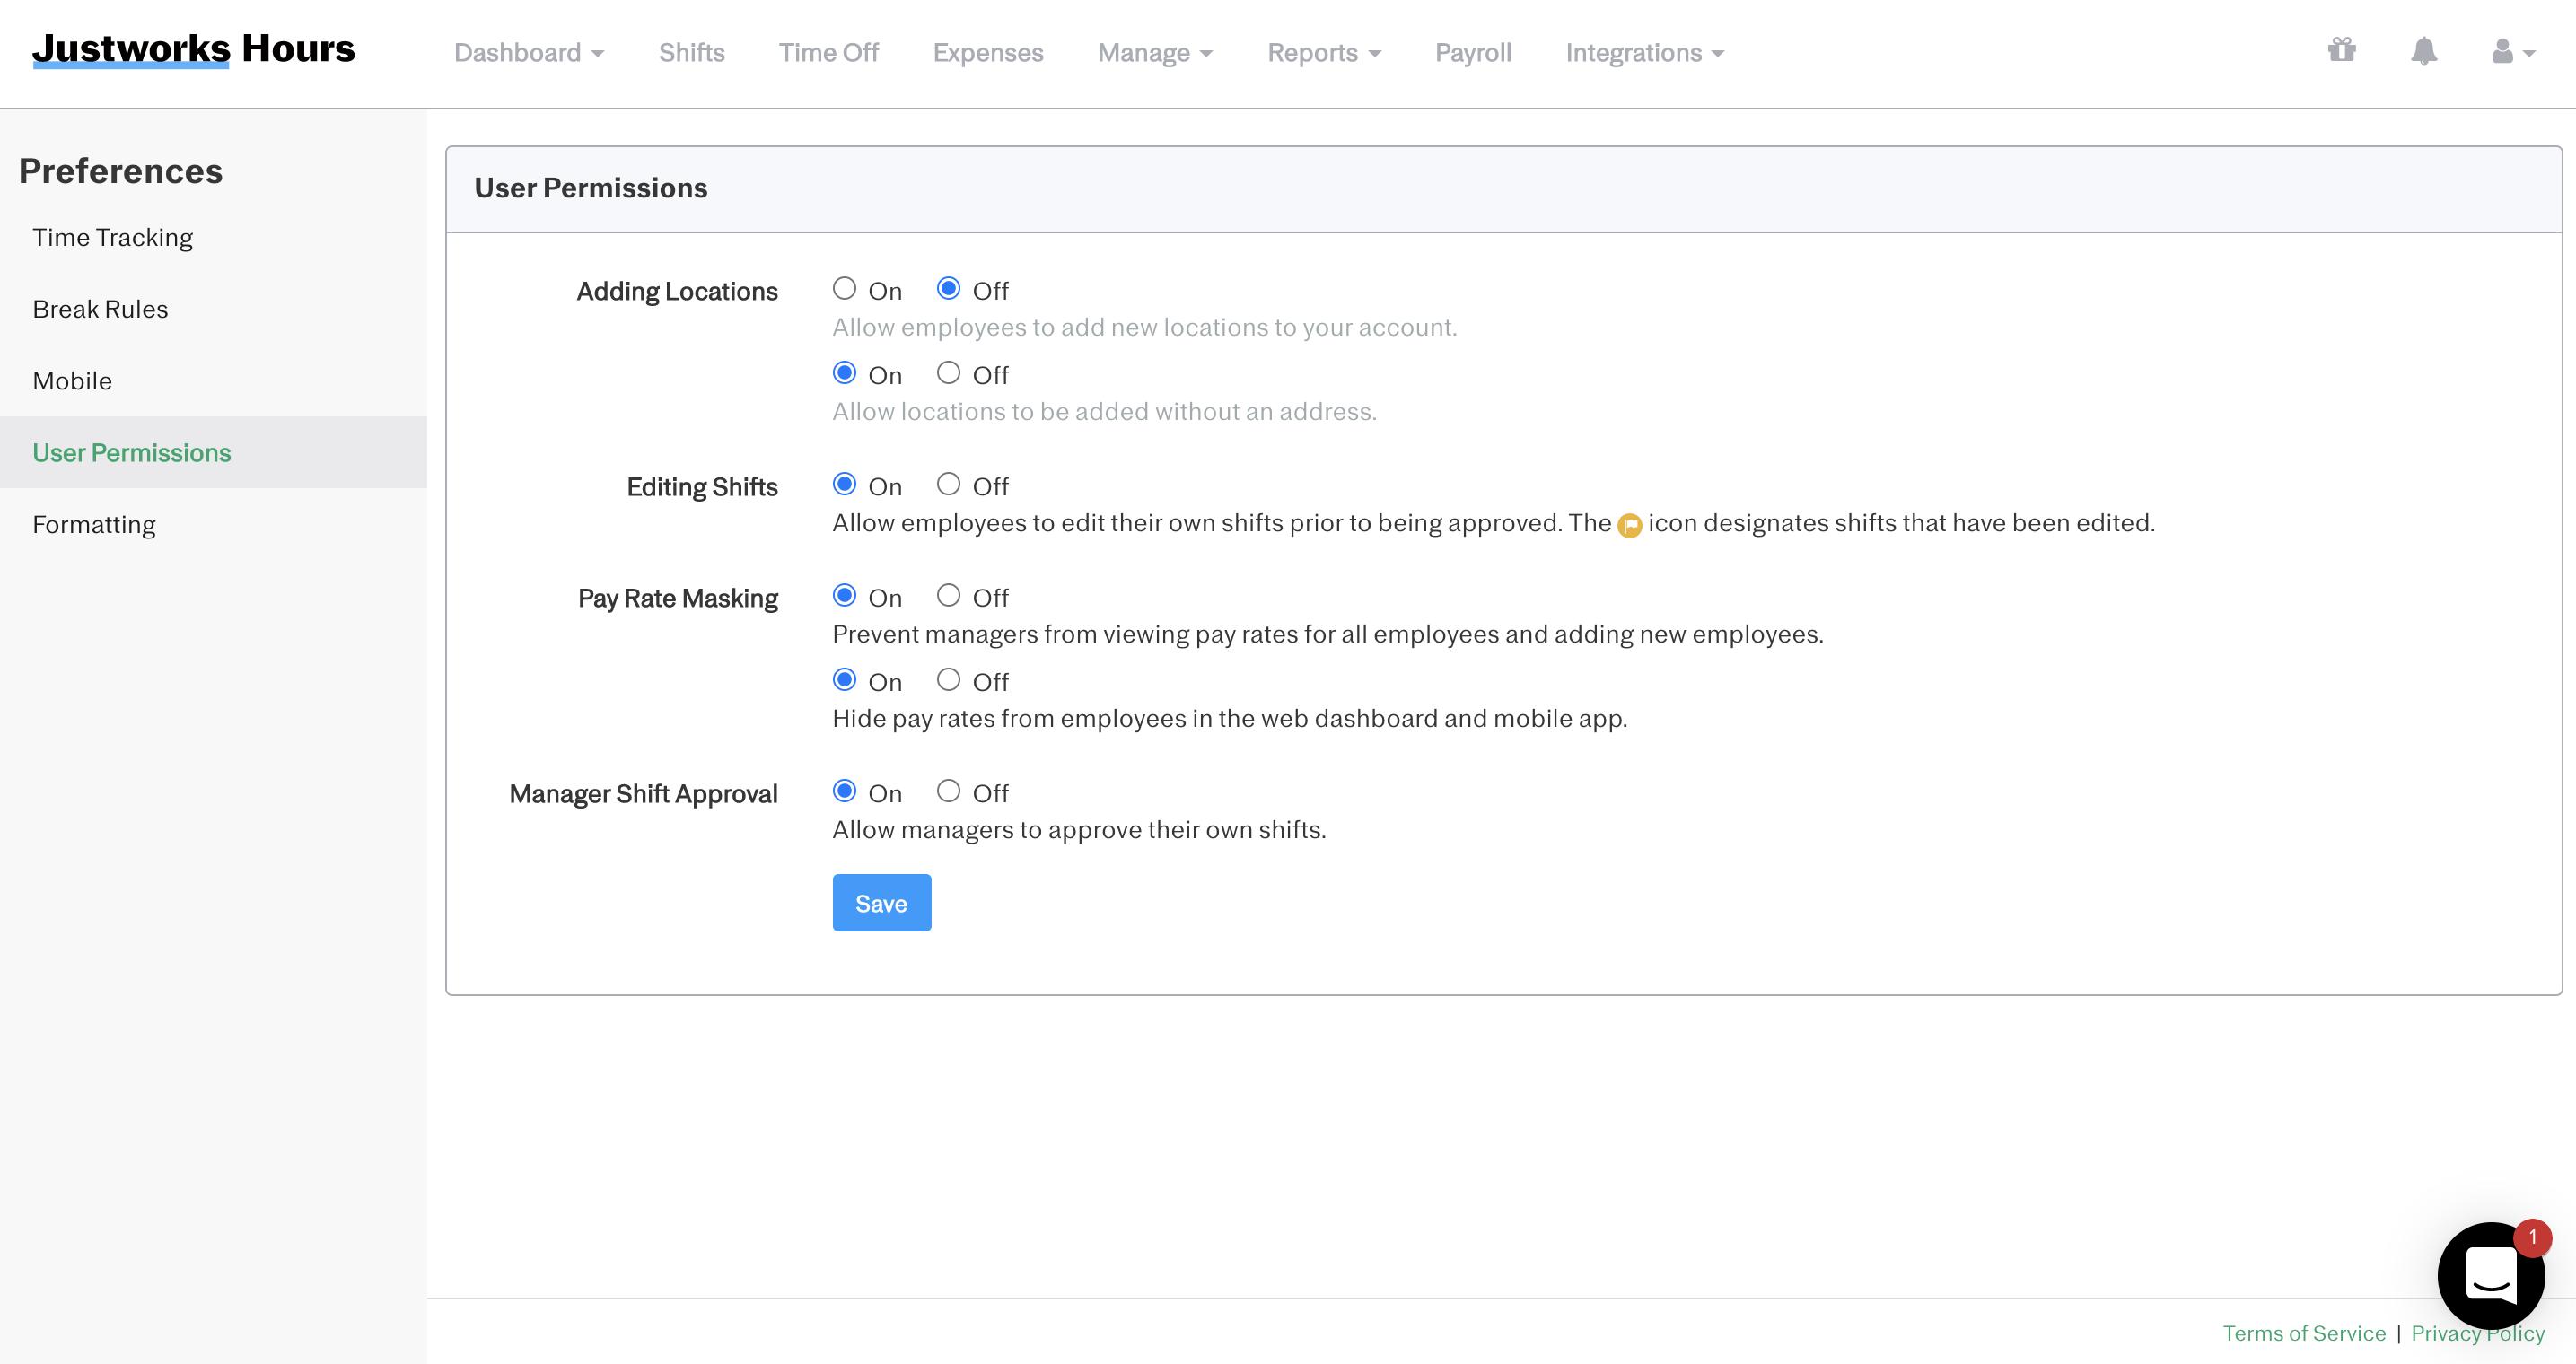 Screenshot showing the 'User Permissions' tab